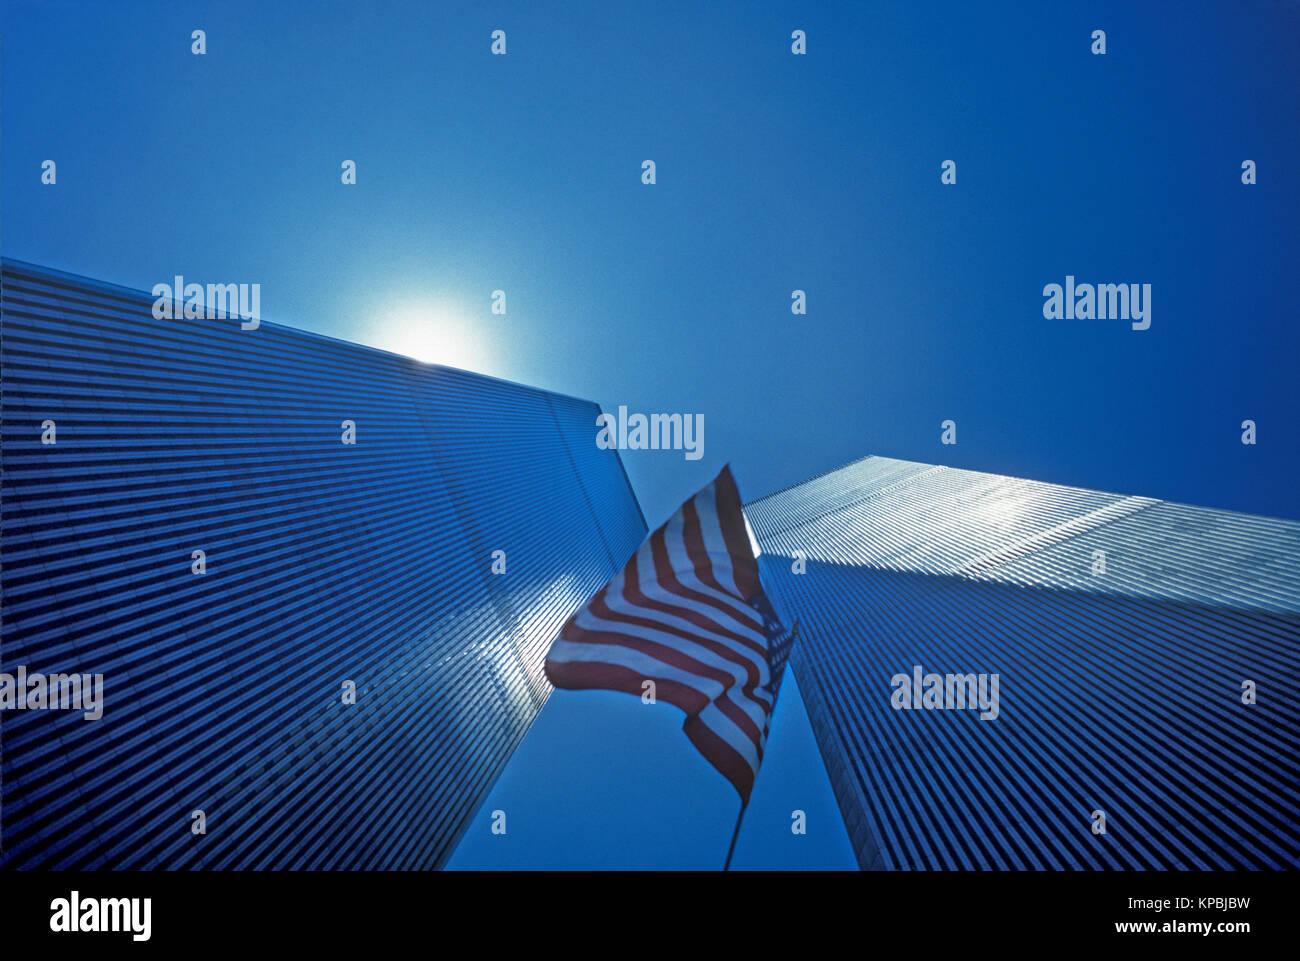 1987 HISTORICAL AMERICAN FLAG TWIN TOWERS (©MINORU YAMASAKI 1973) DOWNTOWN SKYLINE NEW YORK CITY USA - Stock Image